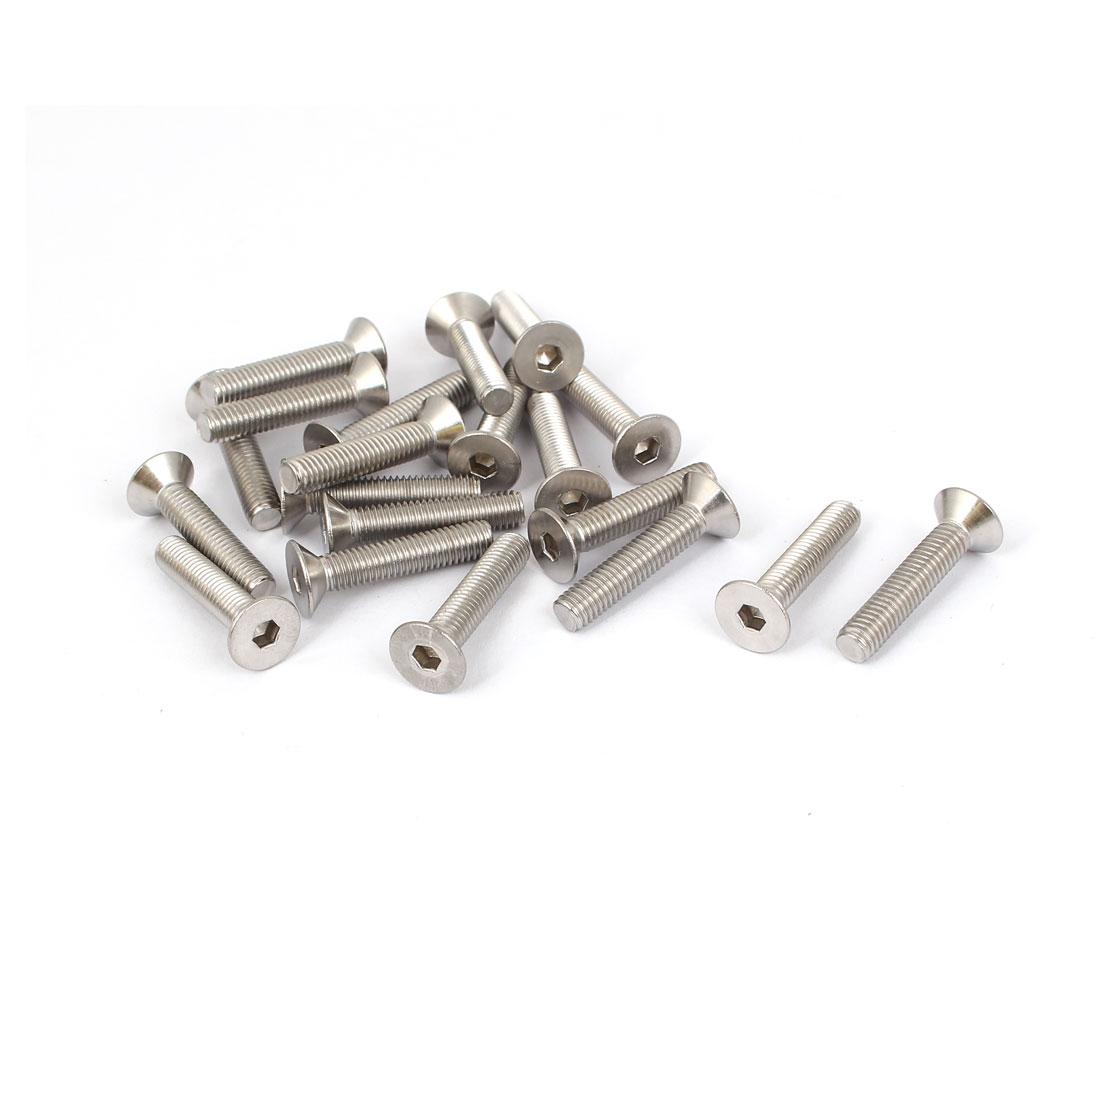 M5x25mm Stainless Steel Hex Socket Flat Head Countersunk Bolts Screw 20pcs